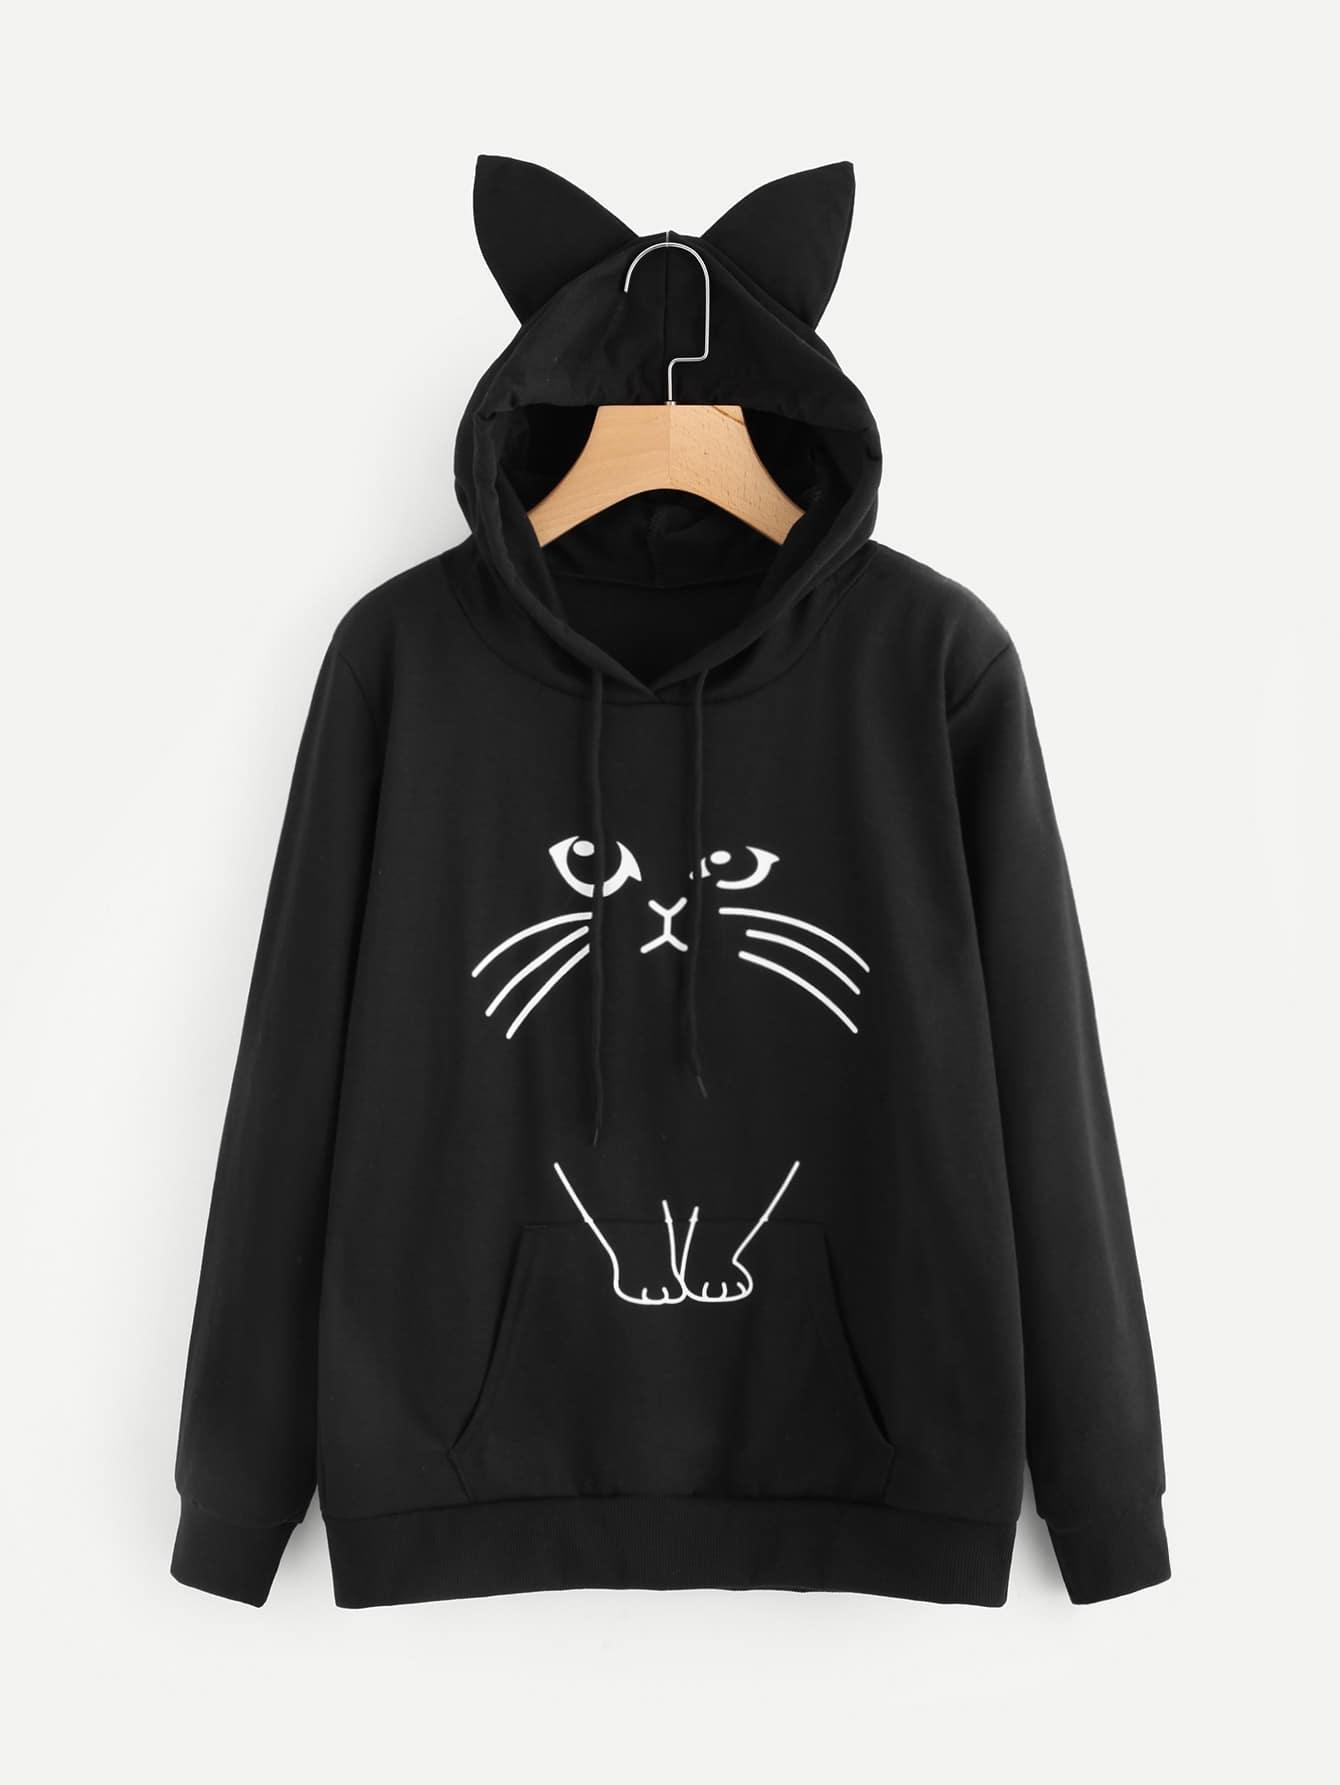 Ear Hooded Graphic Print Sweatshirt